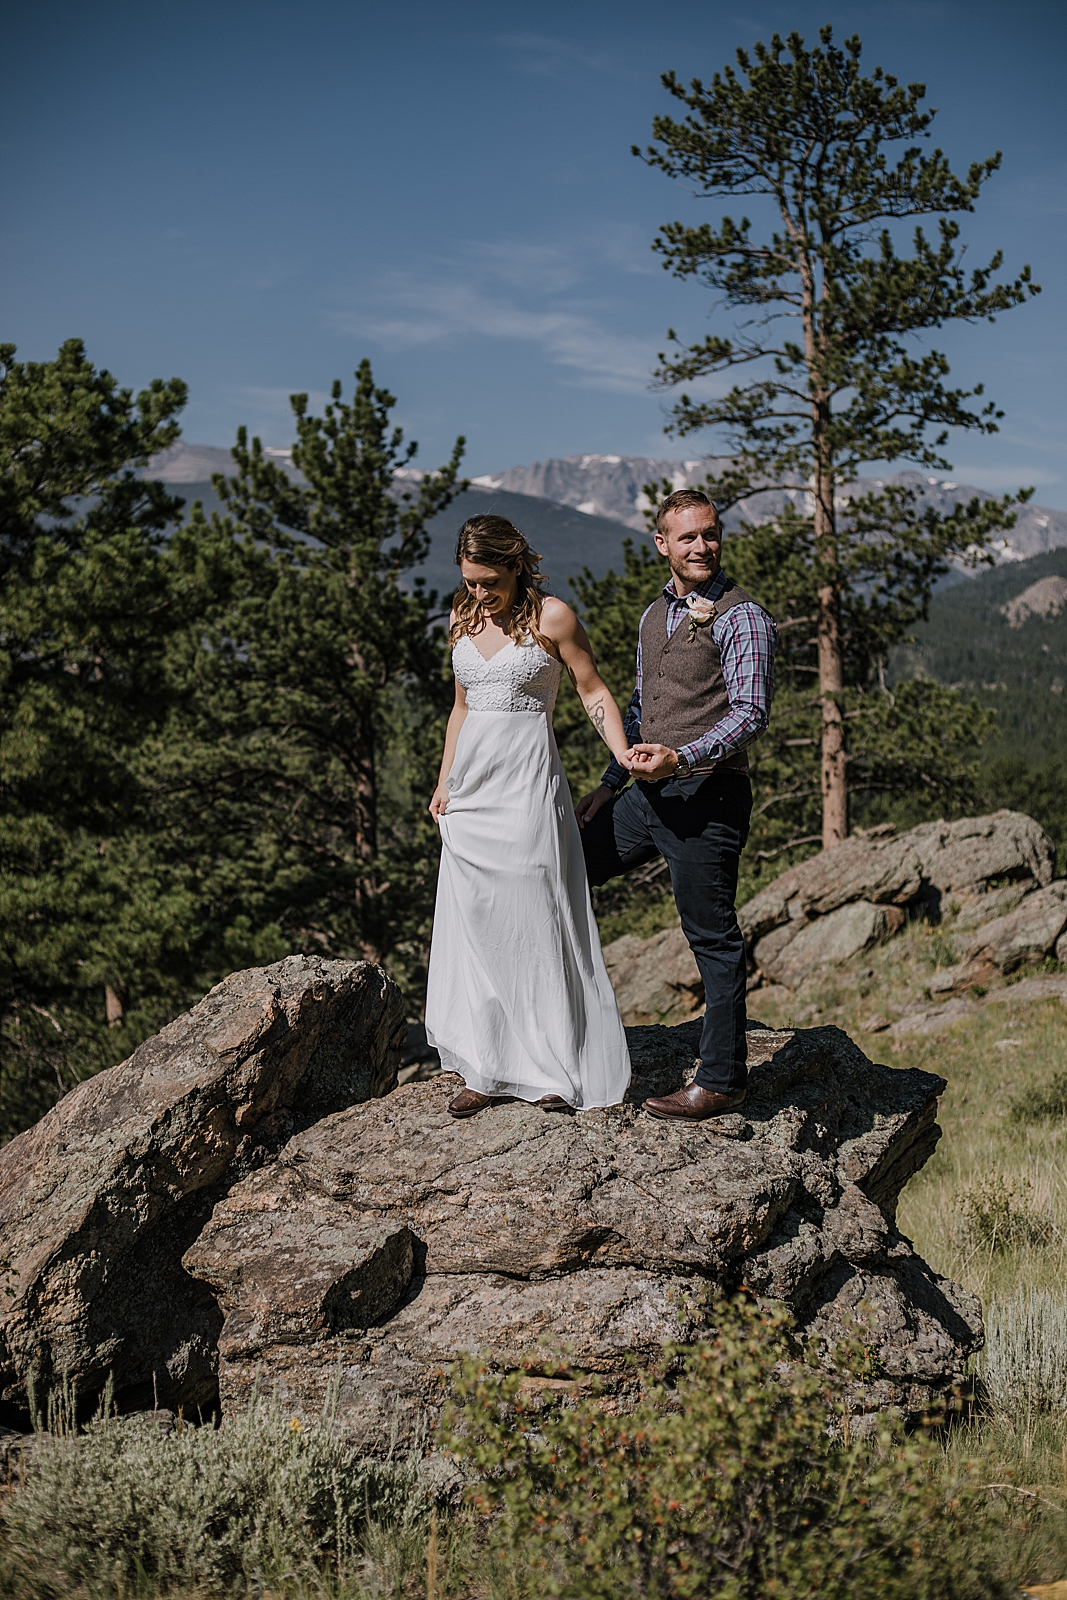 couple hiking, RMNP elopement ceremony, rocky mountain national park elopement, 3M curves elopement, self solemnizing, self solemnization, long's peak, hiking elopement, estes park elopement